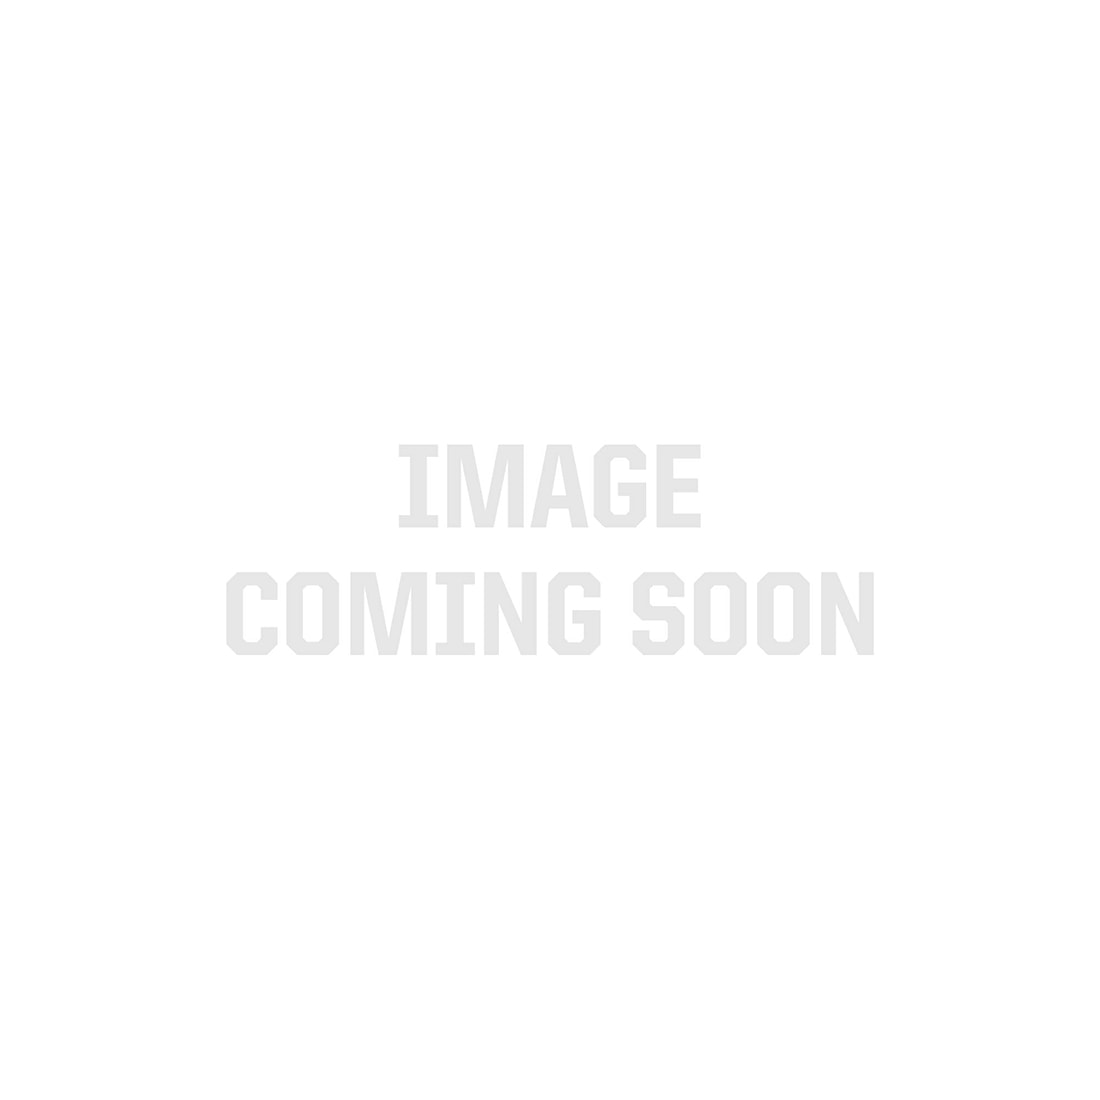 Amber 3528 Single Row LED Strip Light, 120/m, 10mm wide, Sample Kit